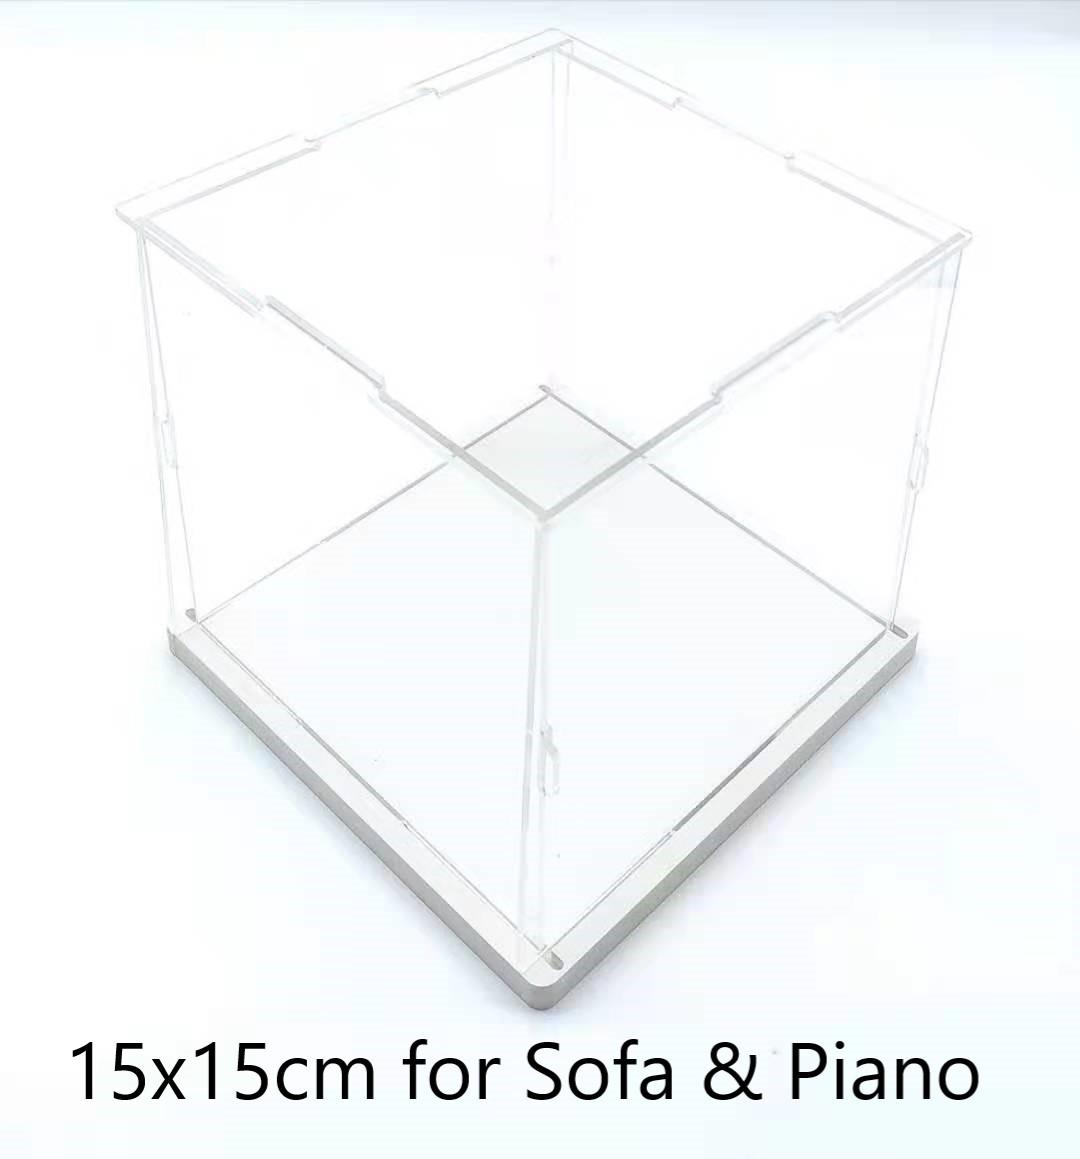 15x15xm for Piano & Sofa